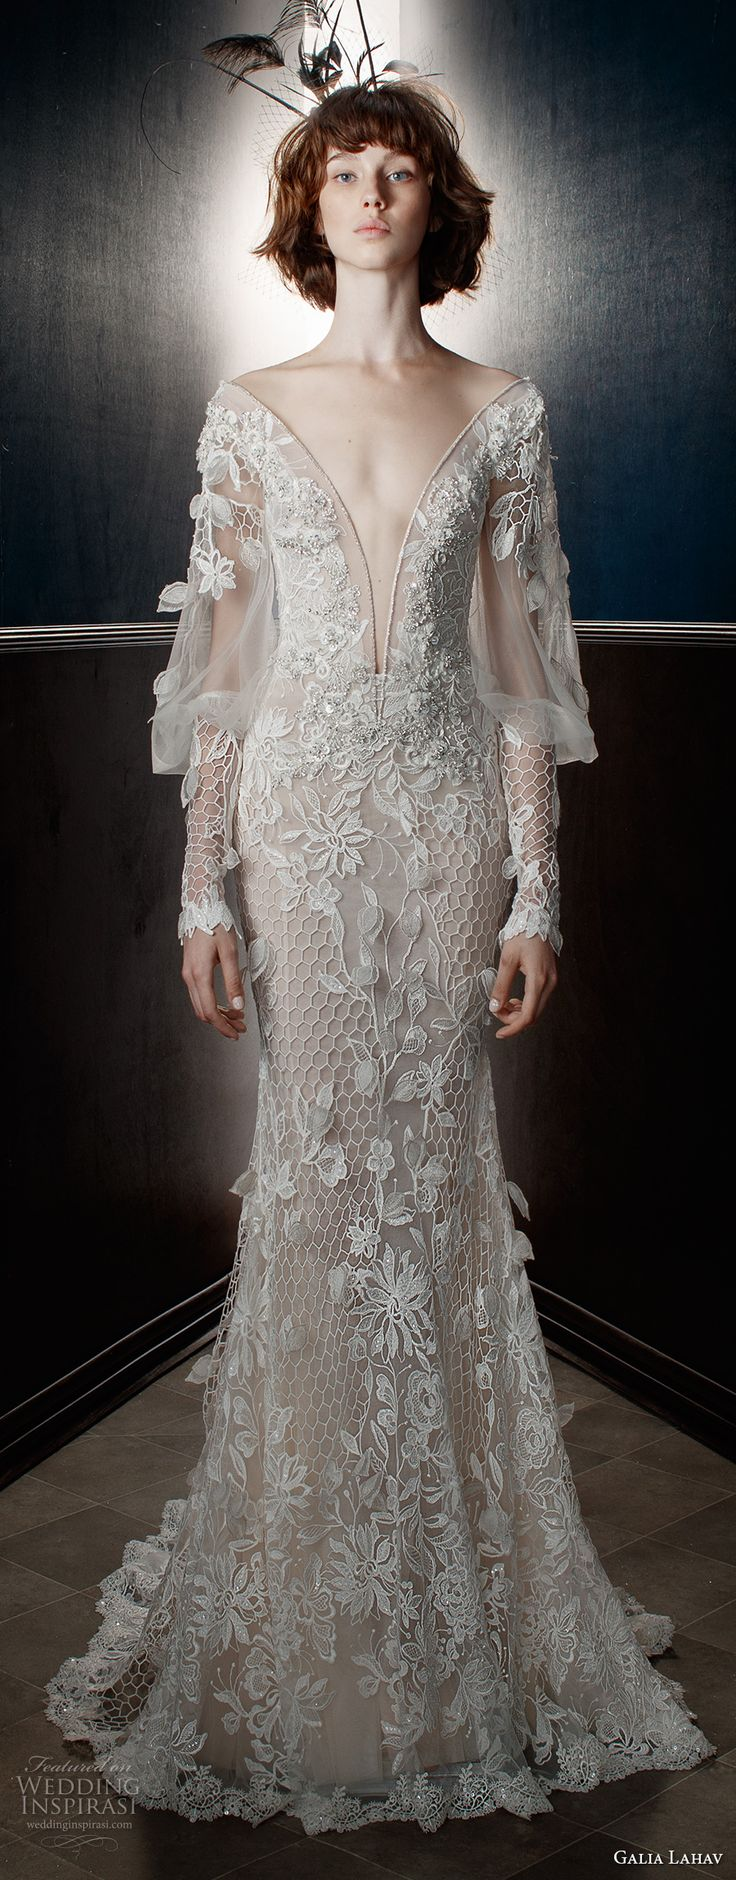 best Свадебные платья images on pinterest high fashion lace